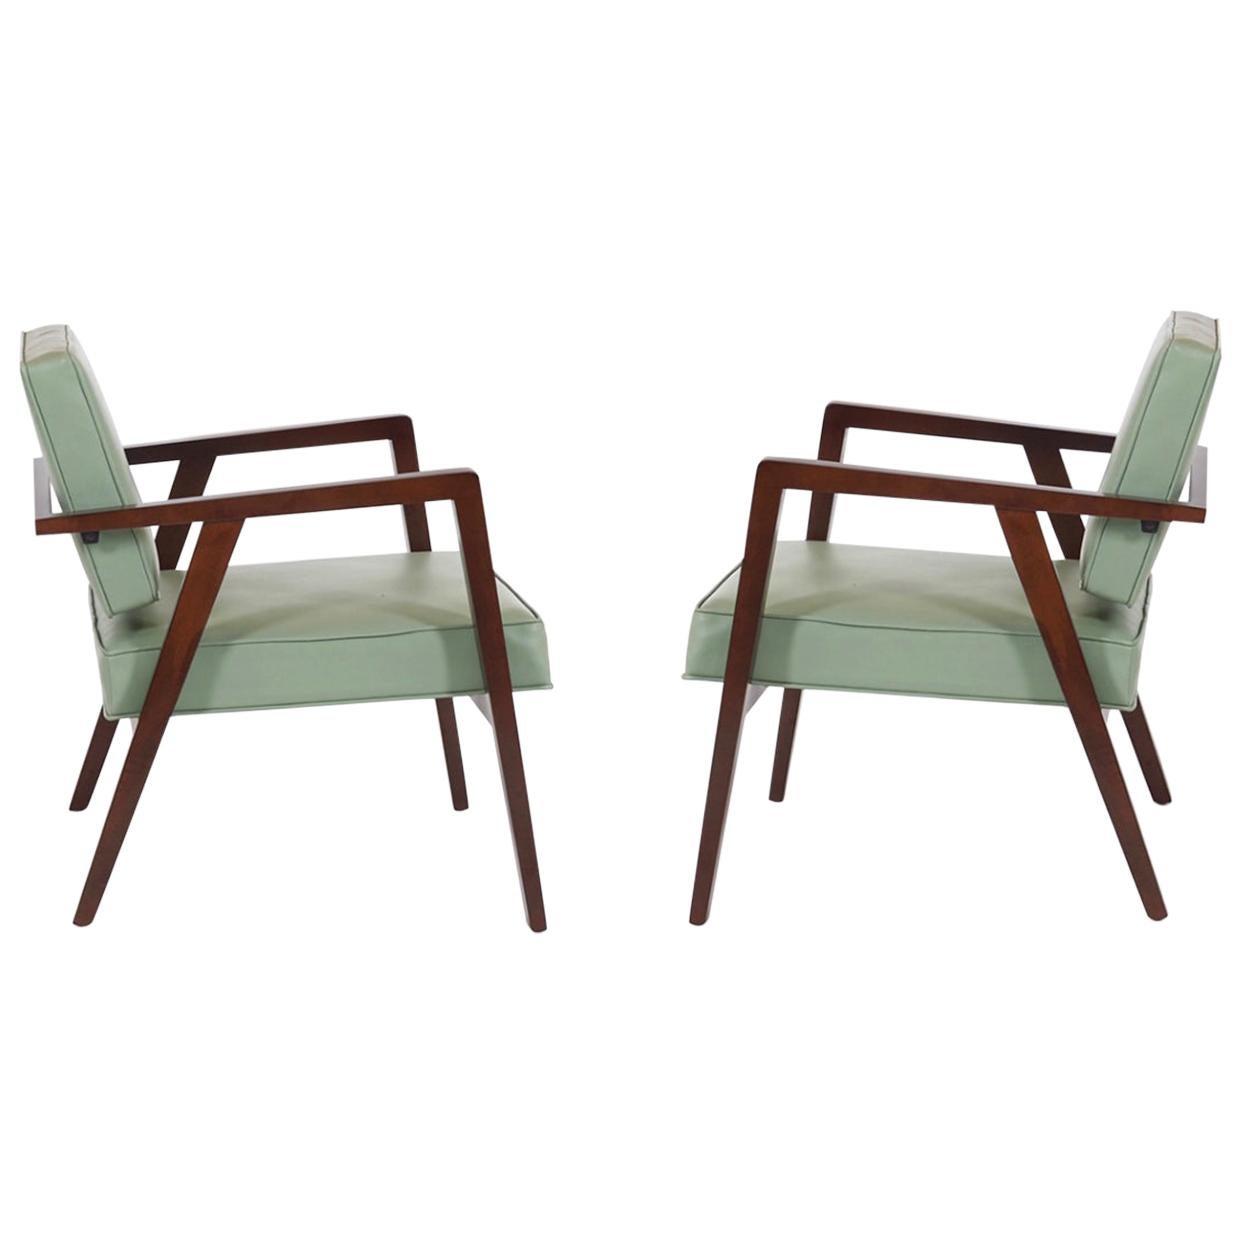 Franco Albini Lounge chairs, Knoll, 1952